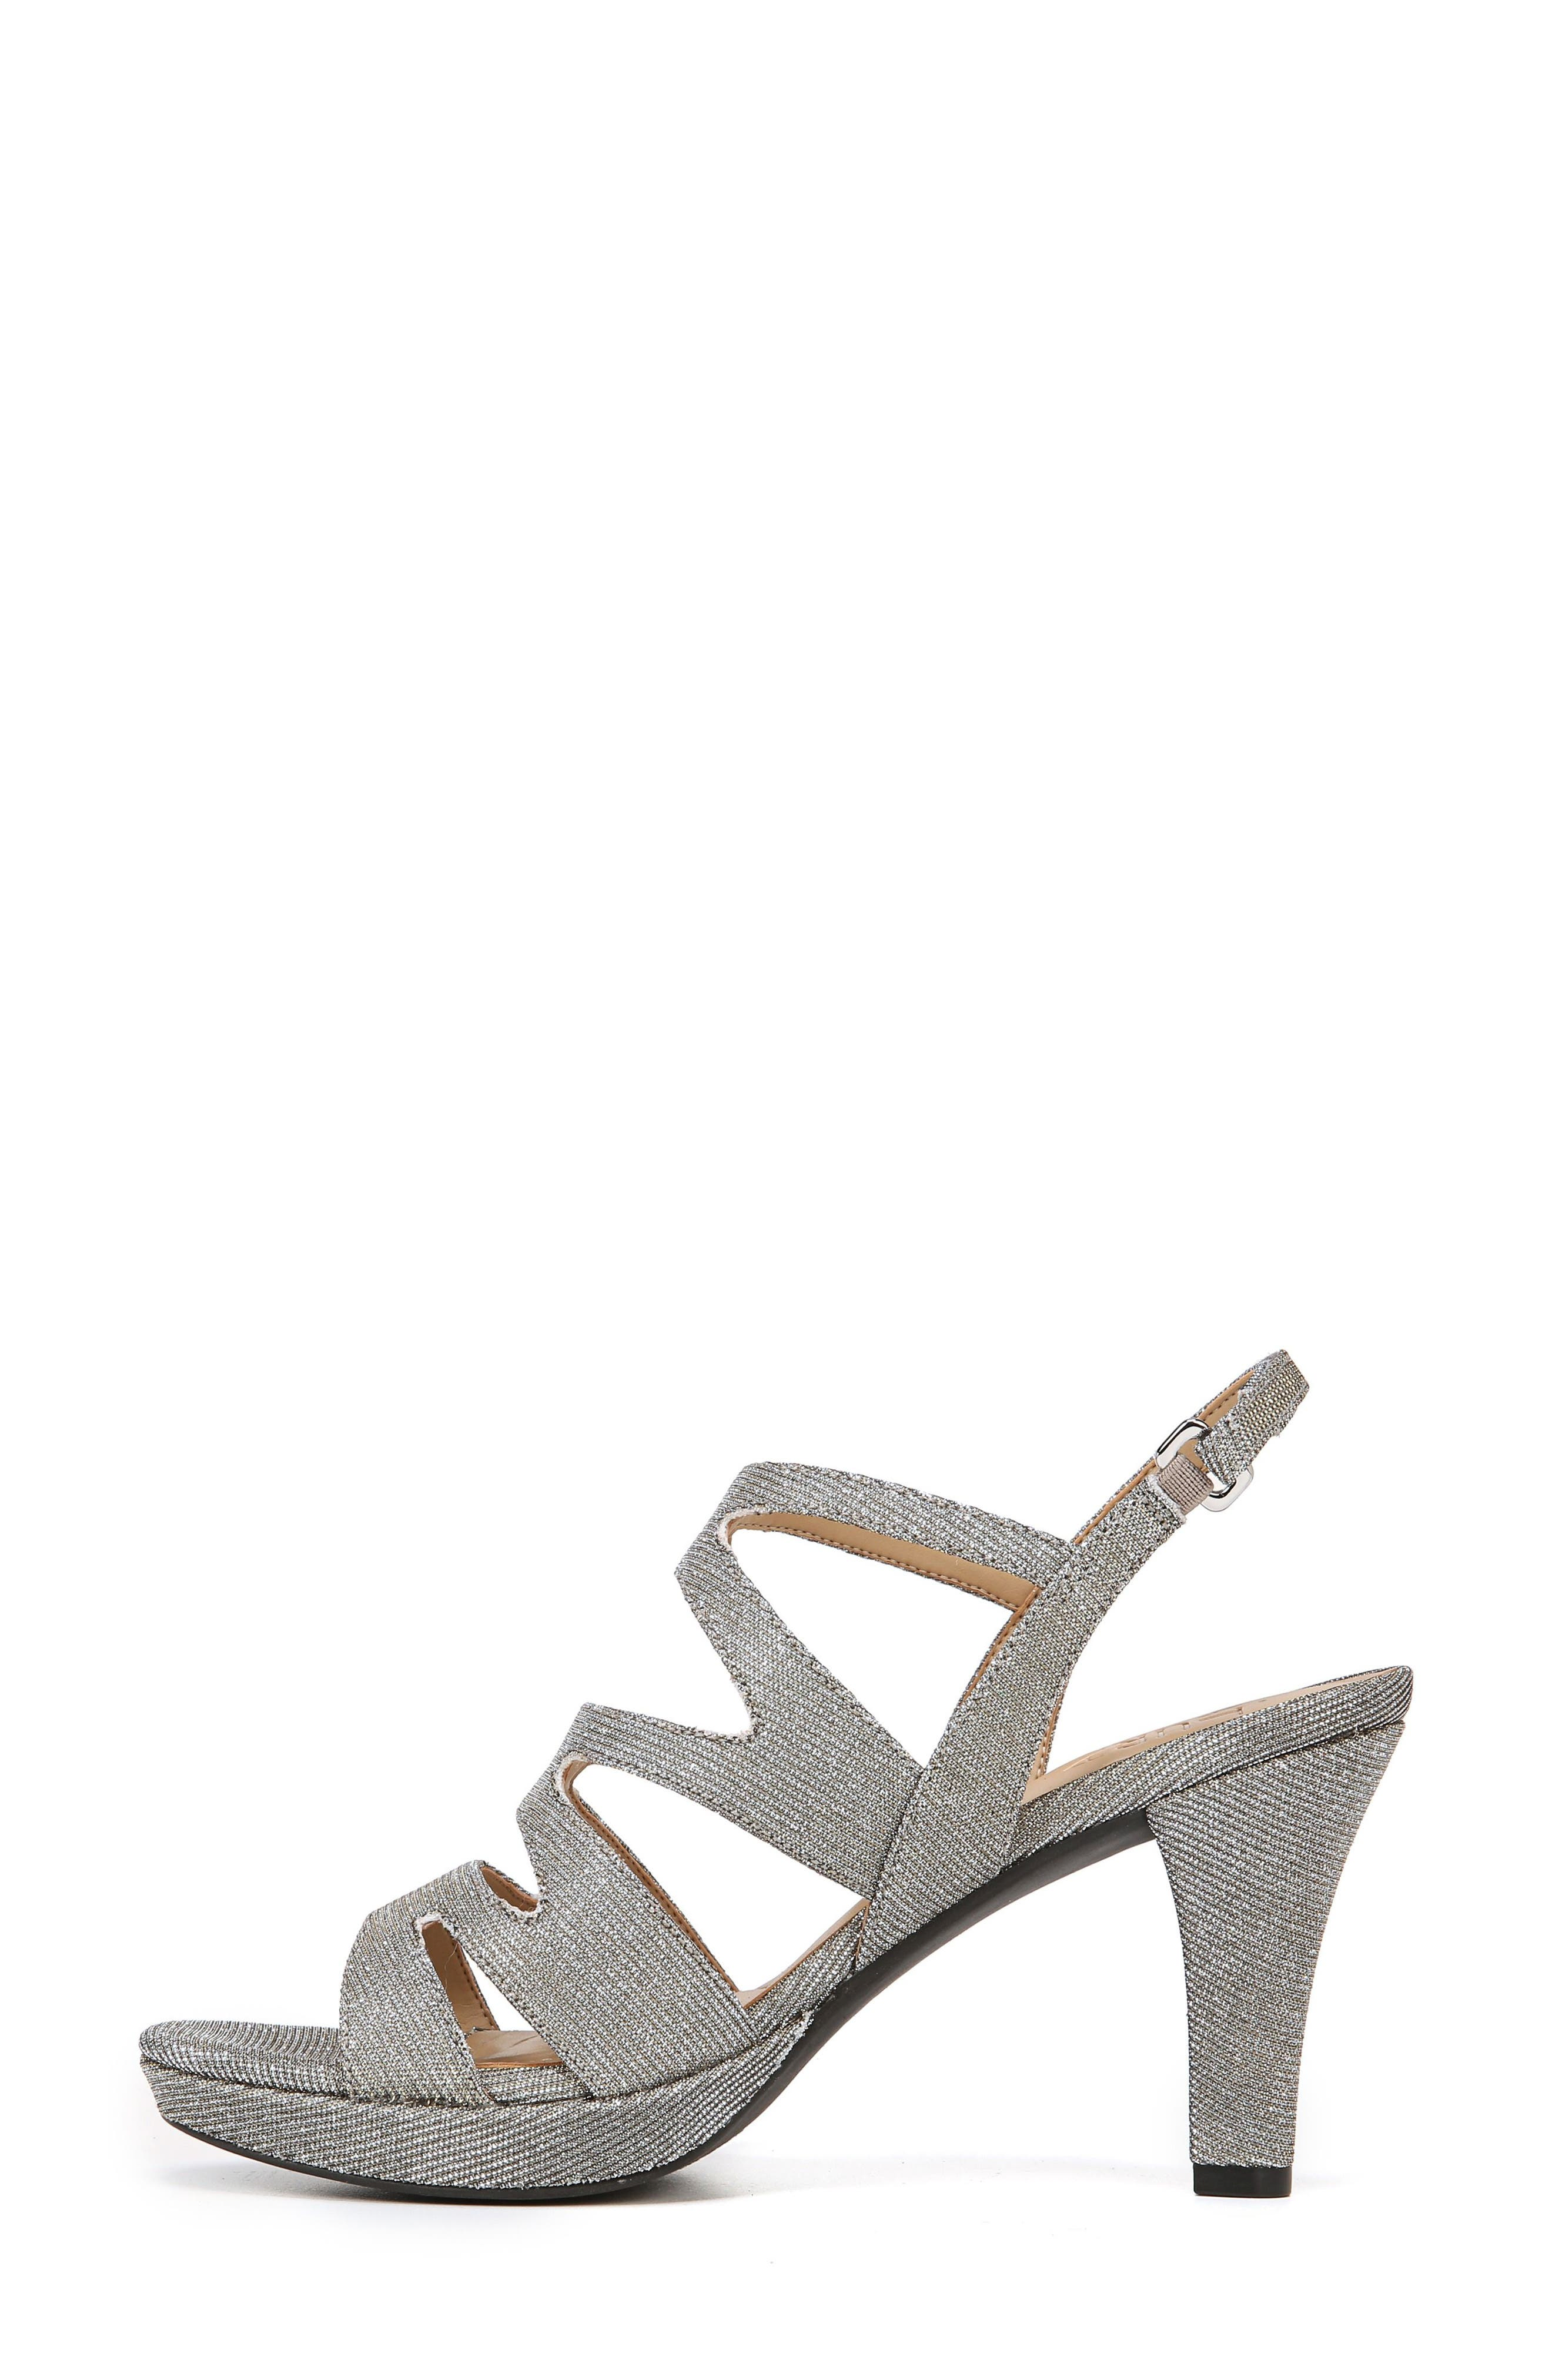 'Pressley' Slingback Platform Sandal,                             Alternate thumbnail 7, color,                             043